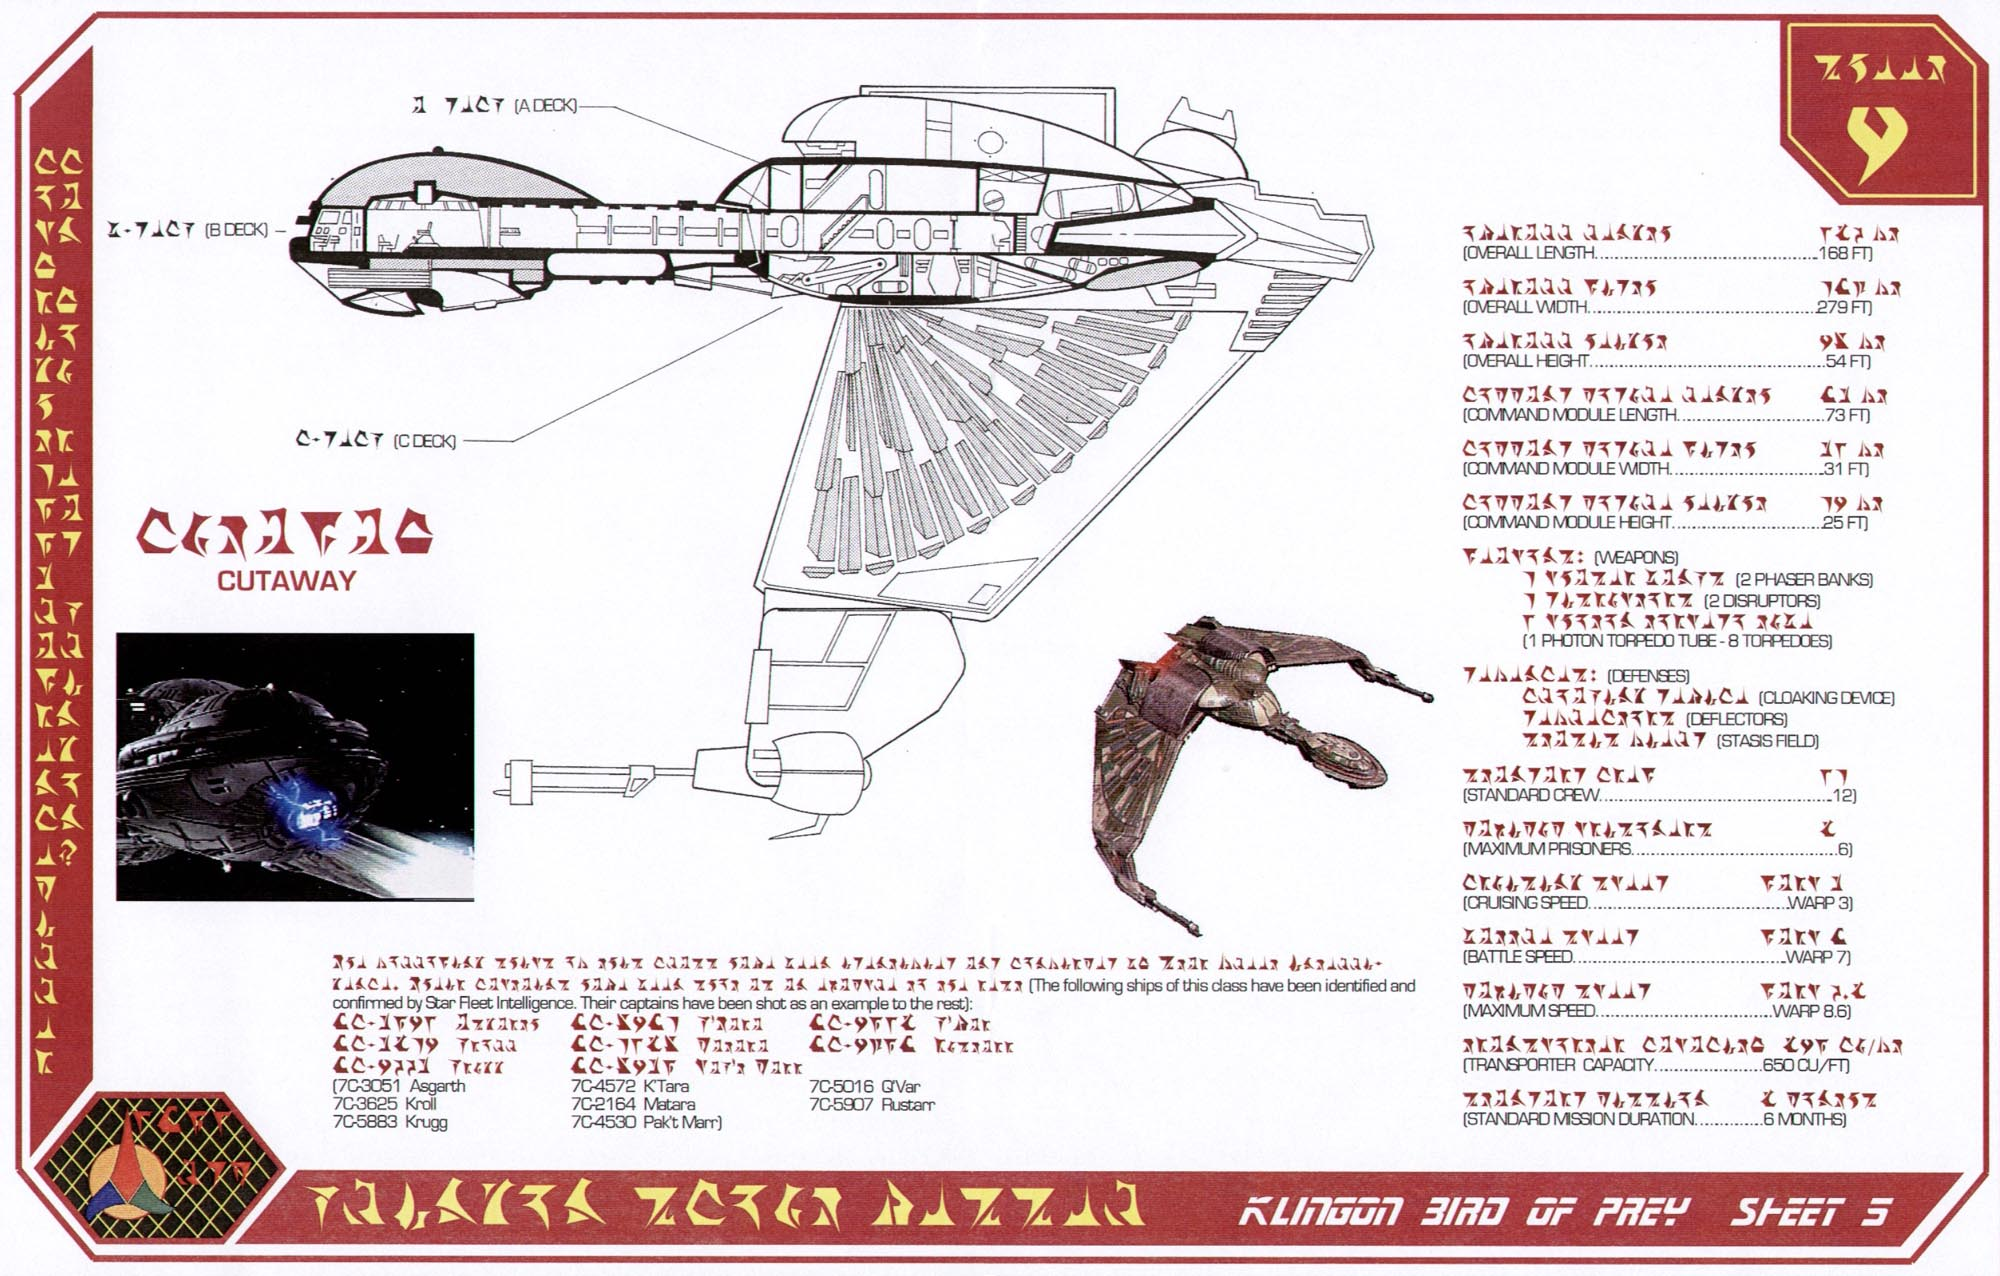 klingonbirdofpreysheet5.jpg